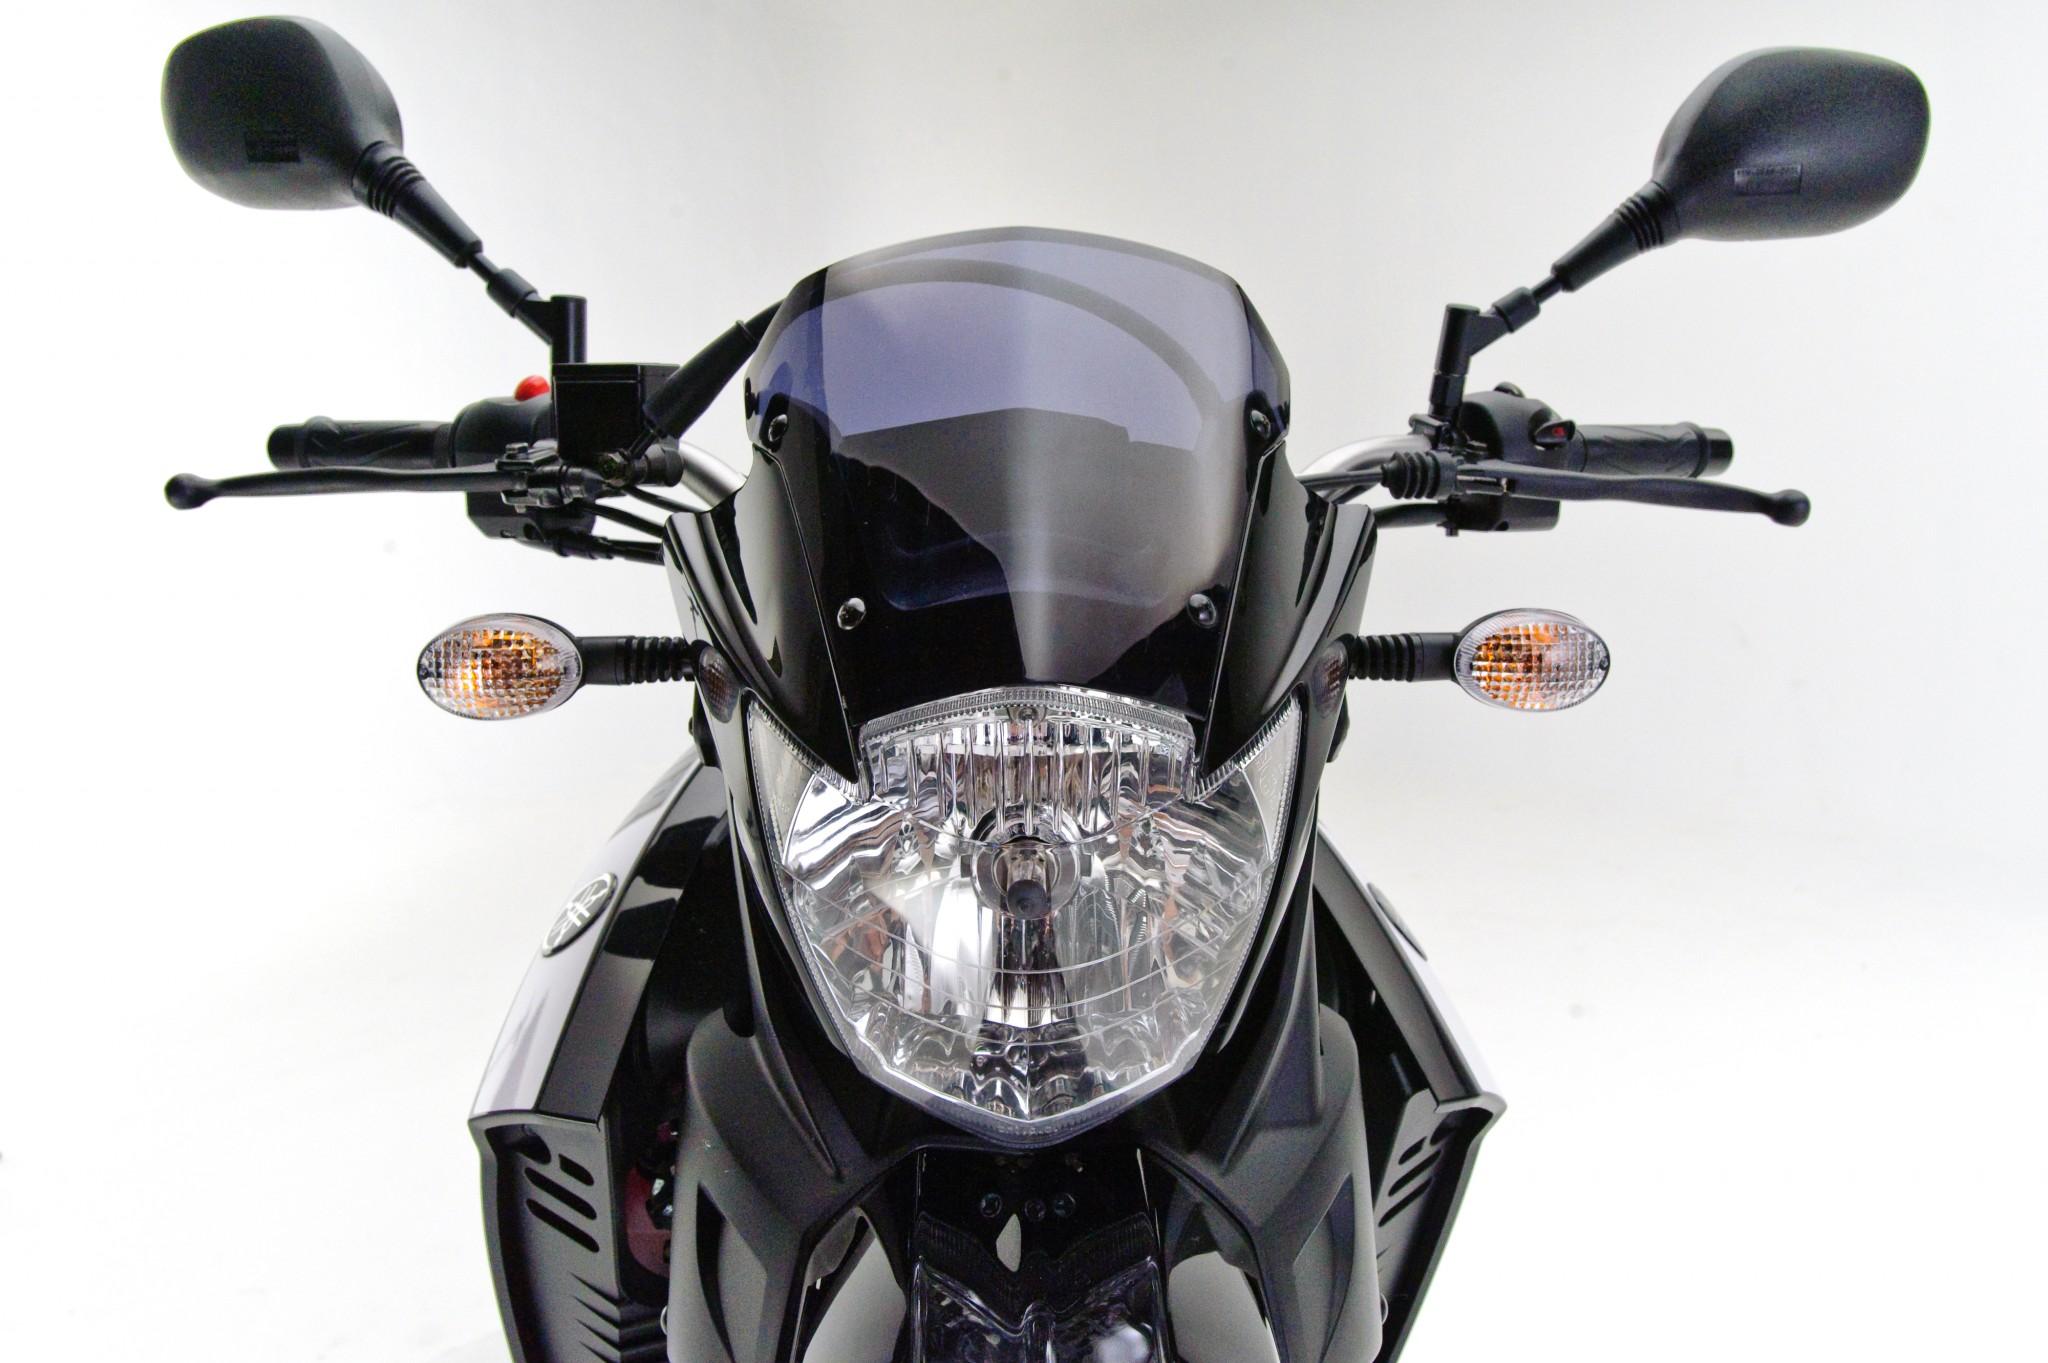 Bolha E Farol Da Yamaha Xt660r 2012 Preta Motos Blog